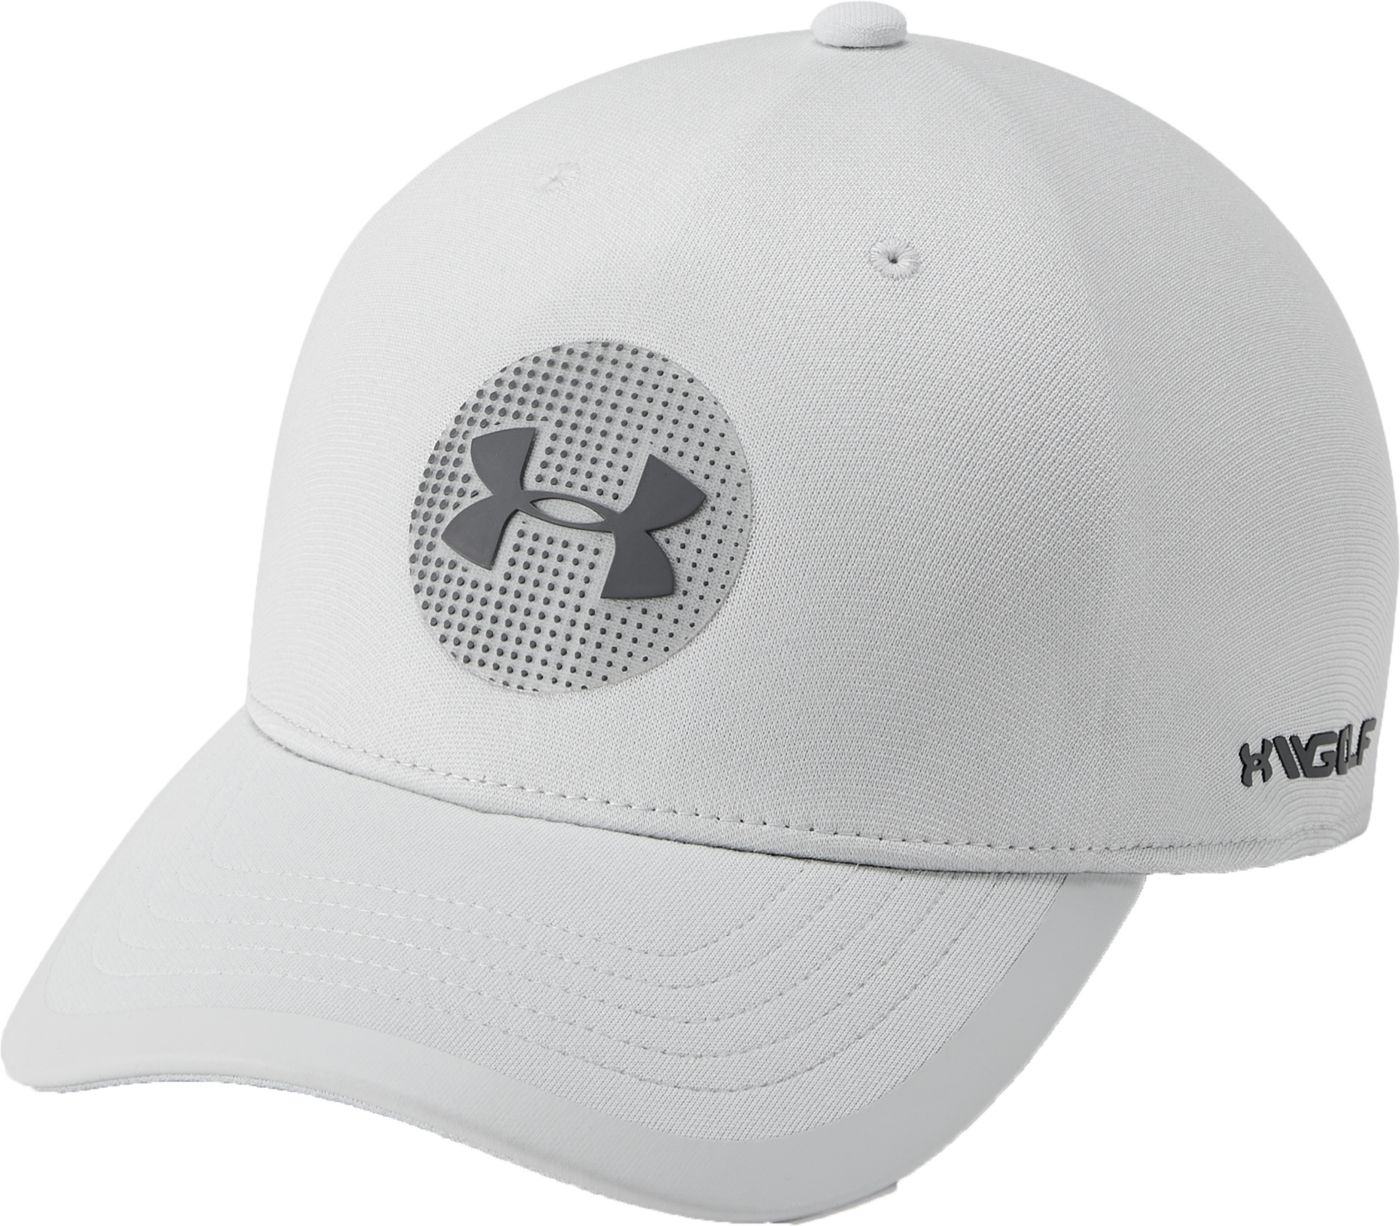 Under Armour Jordan Spieth Official Elevated Tour Golf Hat